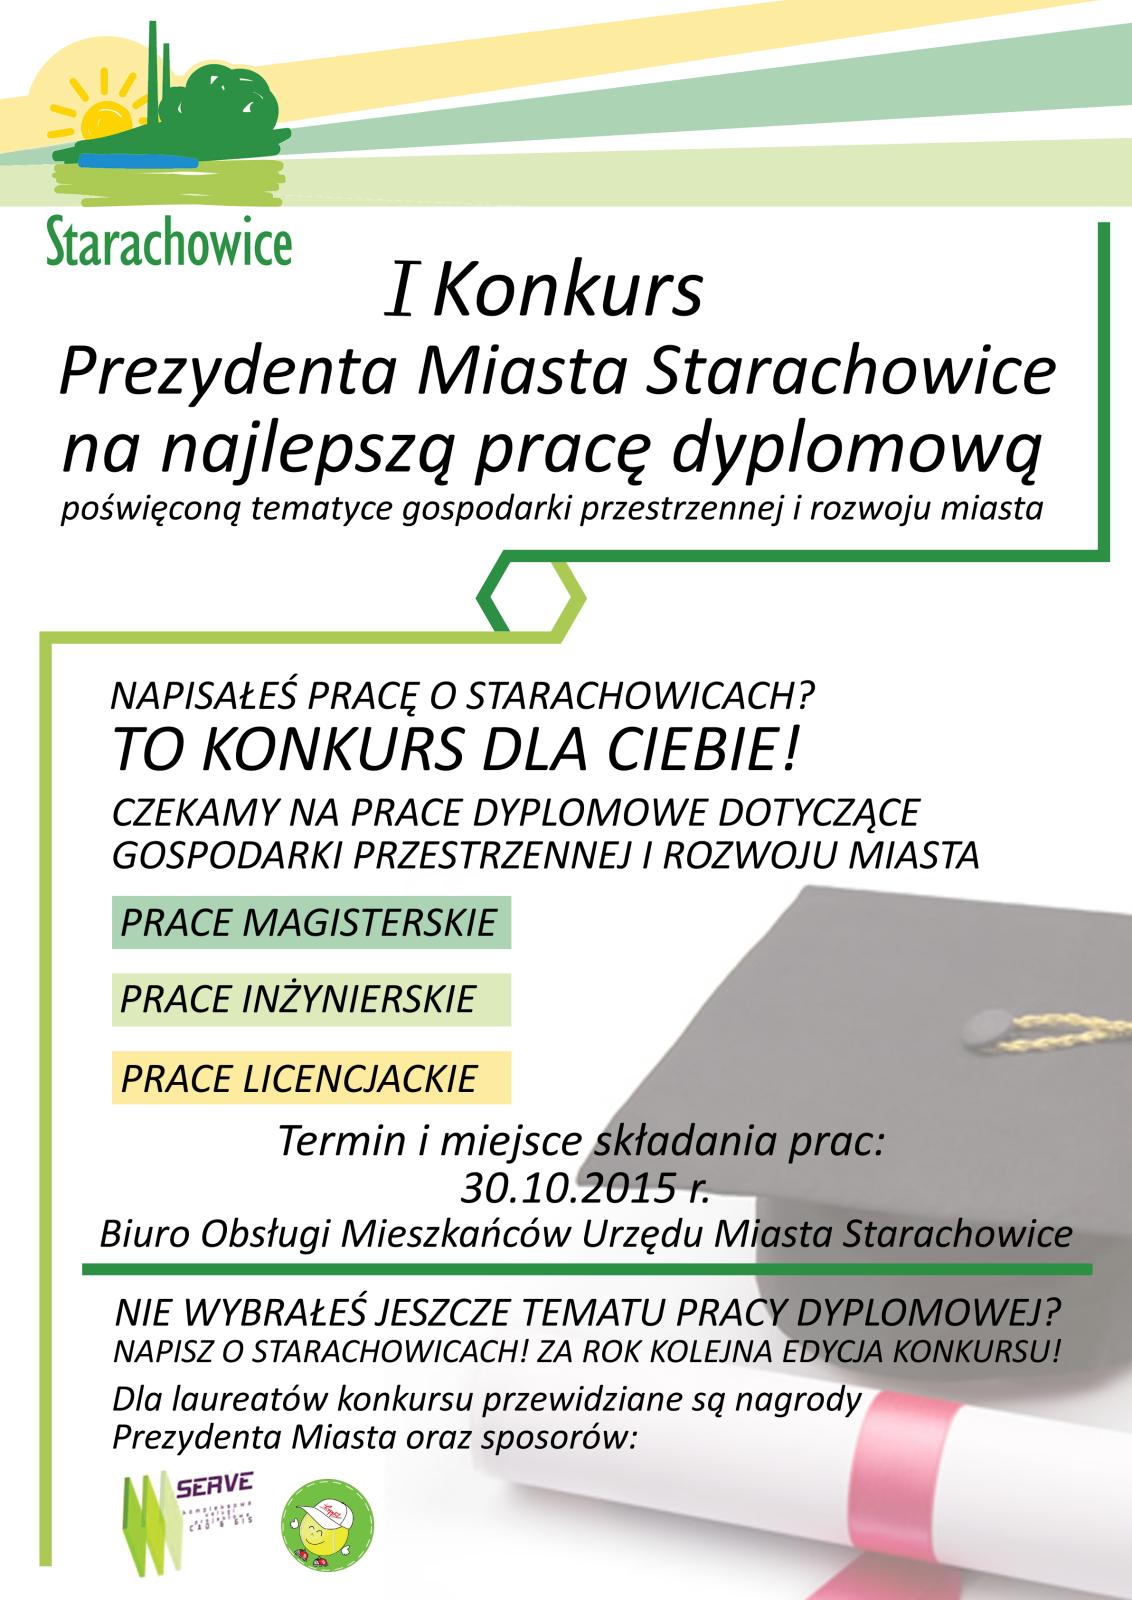 starachowice